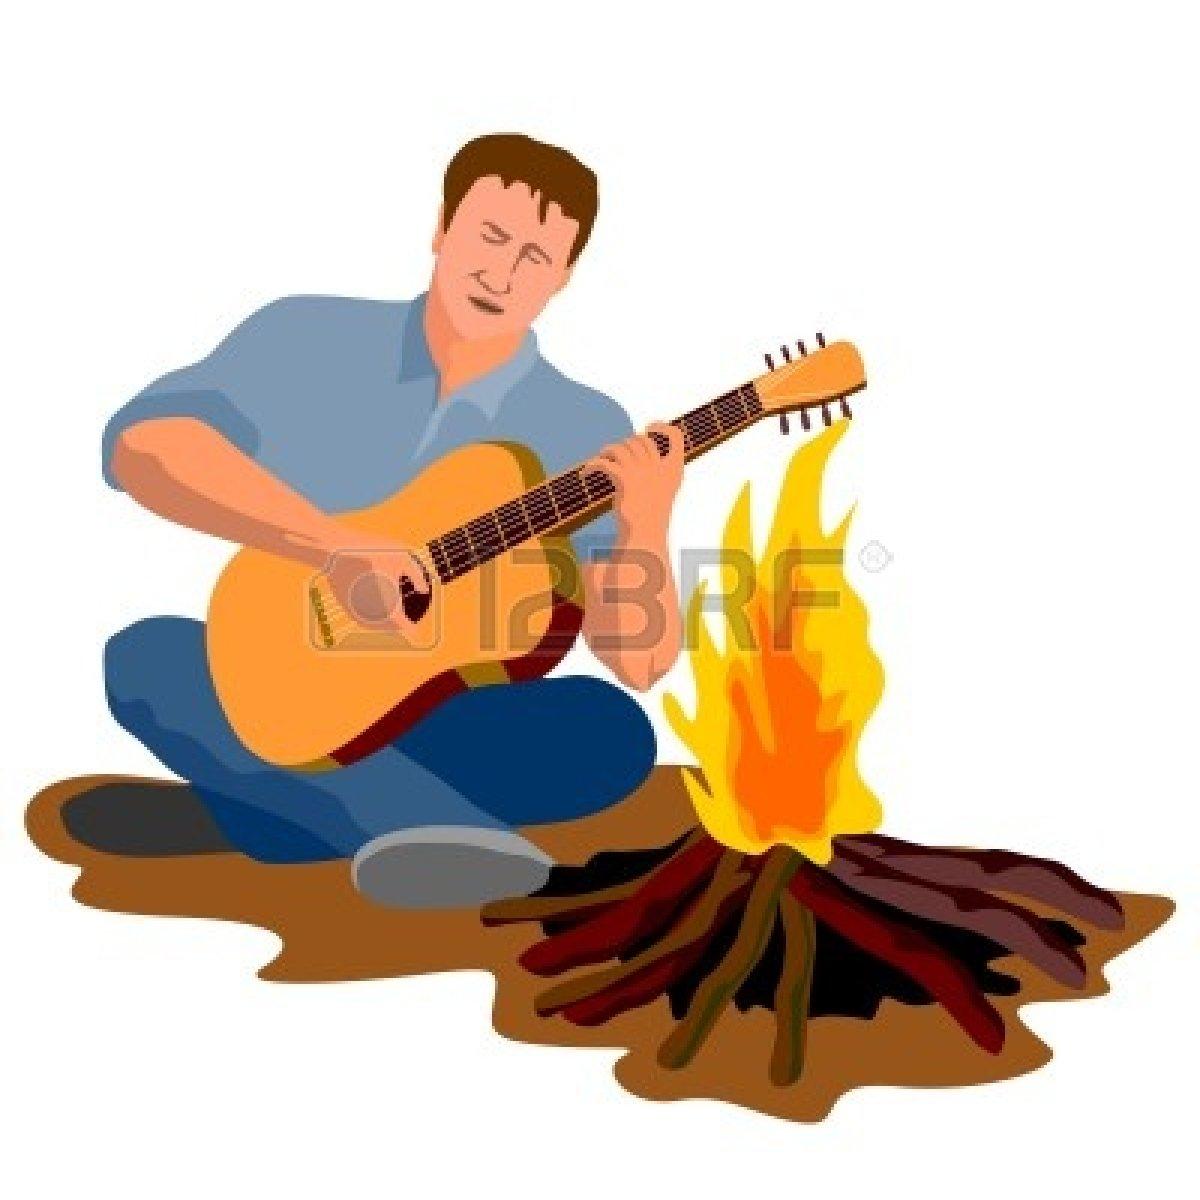 Campfire clipart beach bonfire Cartoon Panda Bonfire Free Images